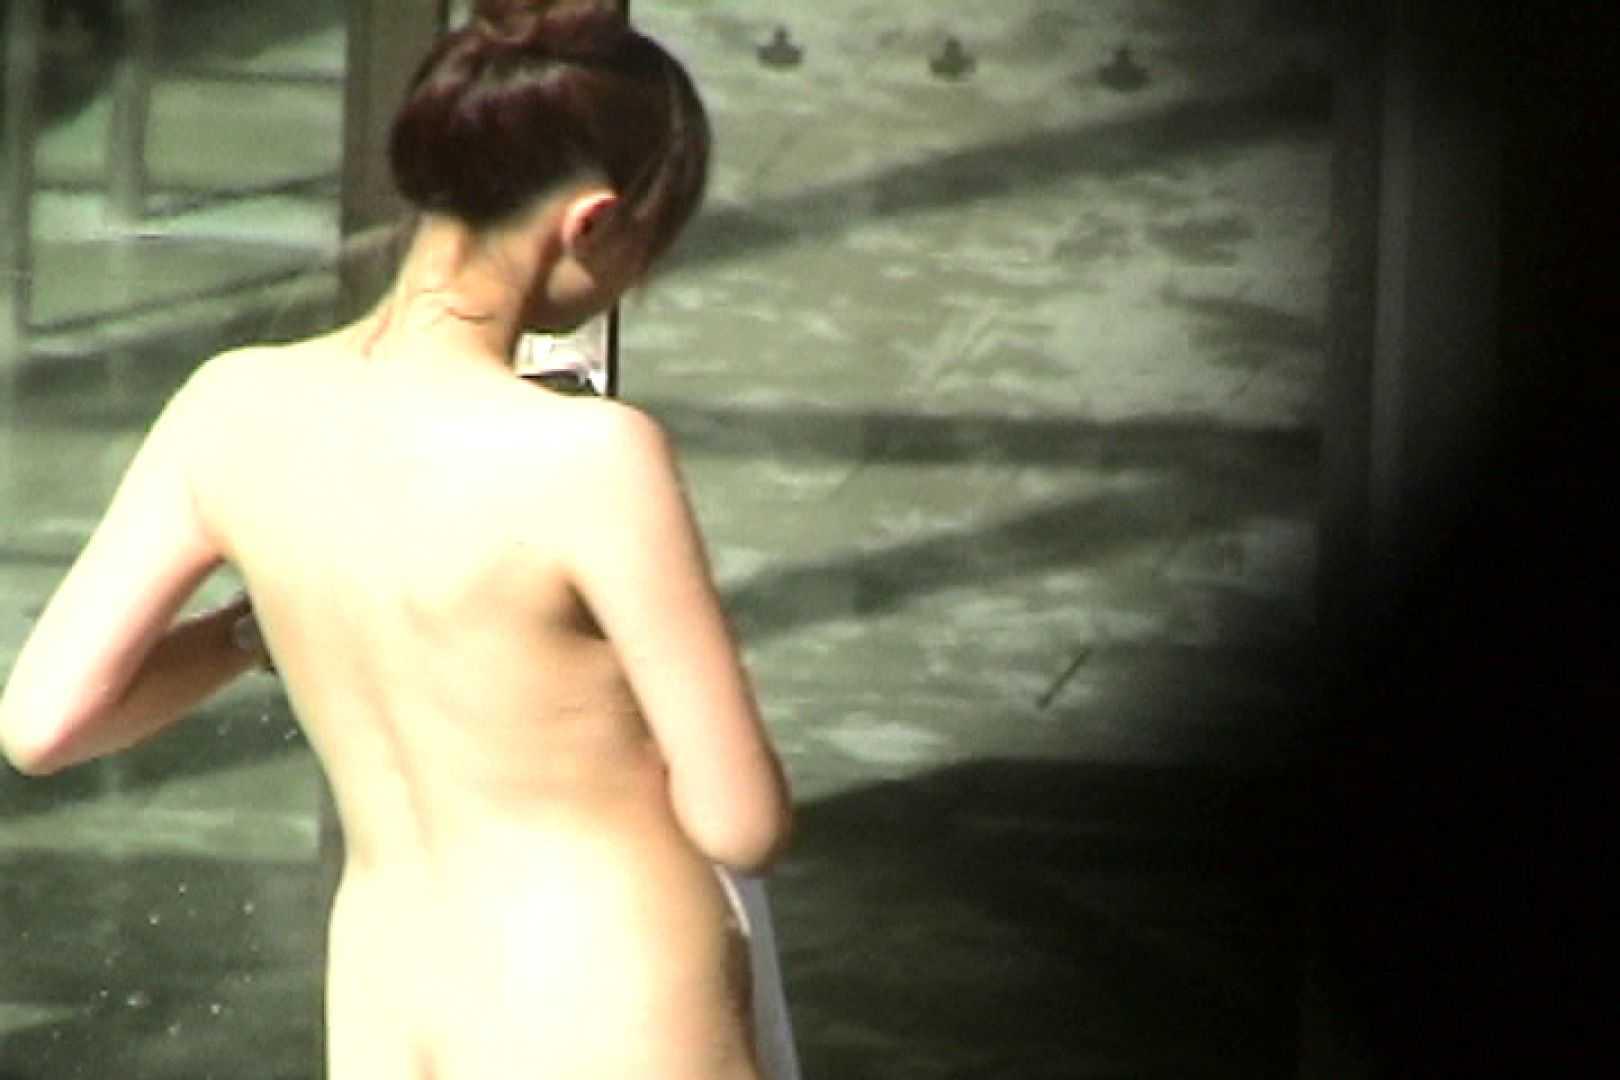 No.16 細身妊婦の膨らんだお腹とオッパイ 細身 盗み撮り動画キャプチャ 91枚 10